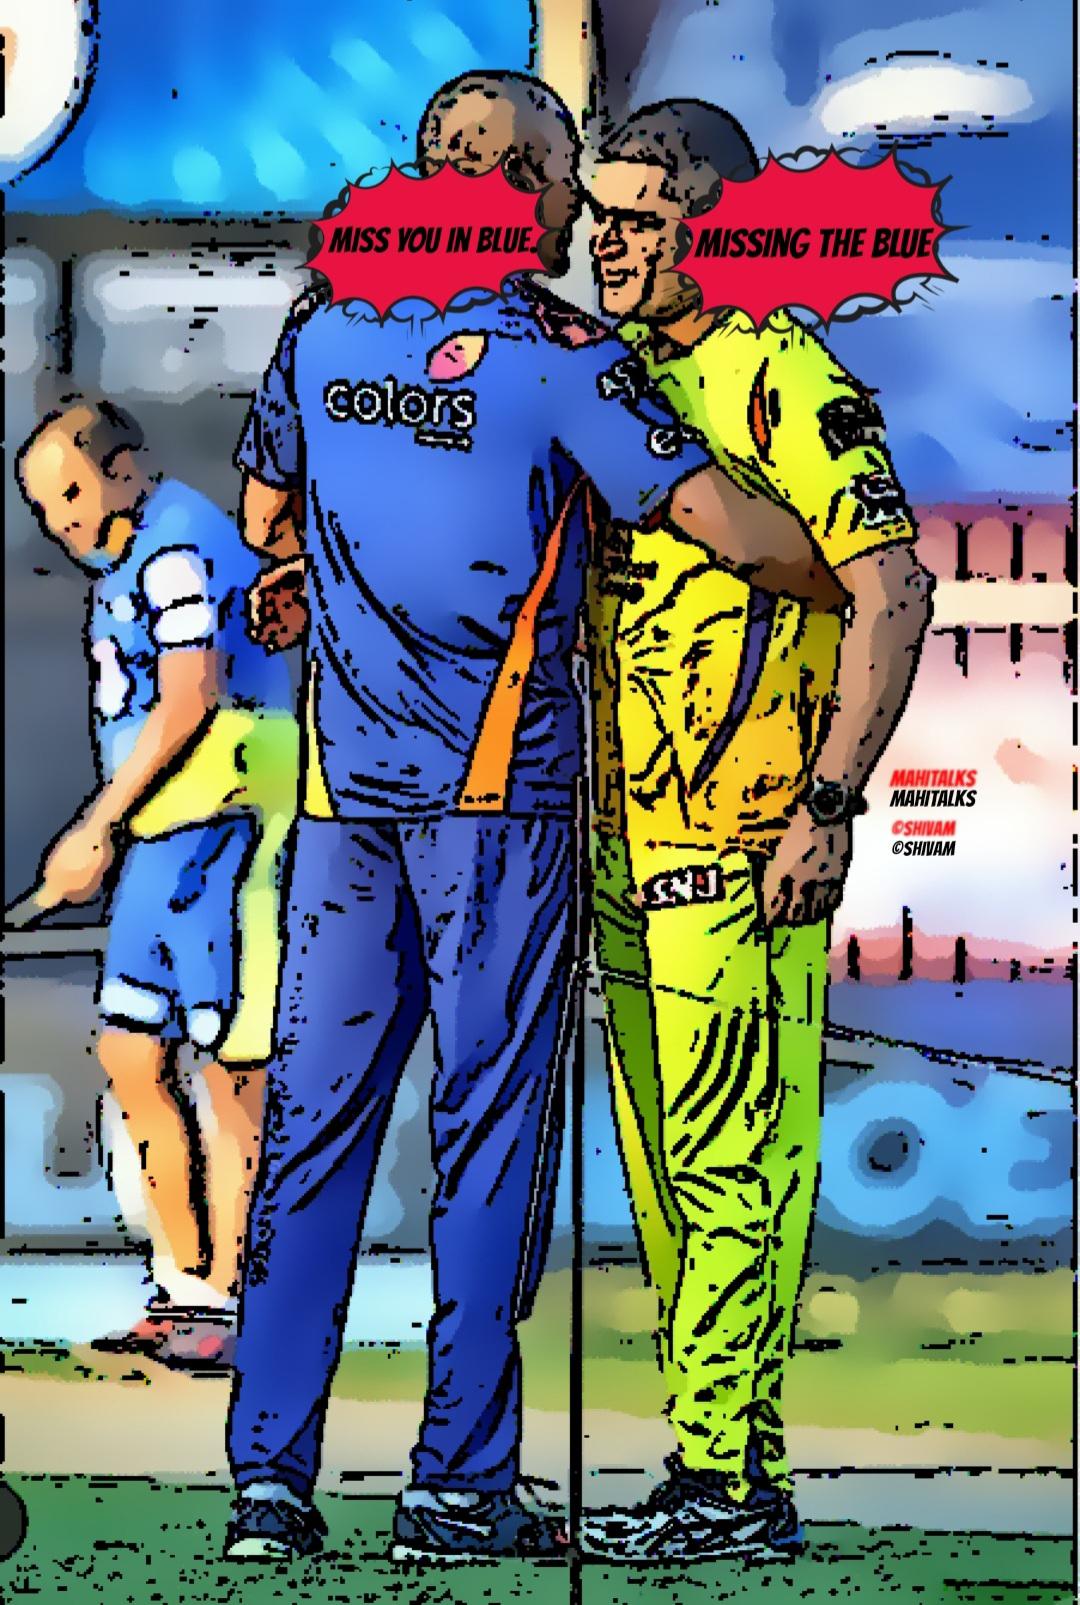 CSK, MI, Chennai, Mumbai, Dhoni, Hardik, Cricket, Cricketer, IPL, world Cup, Captain Cool, MSD, indian Skipper, Men in Blue